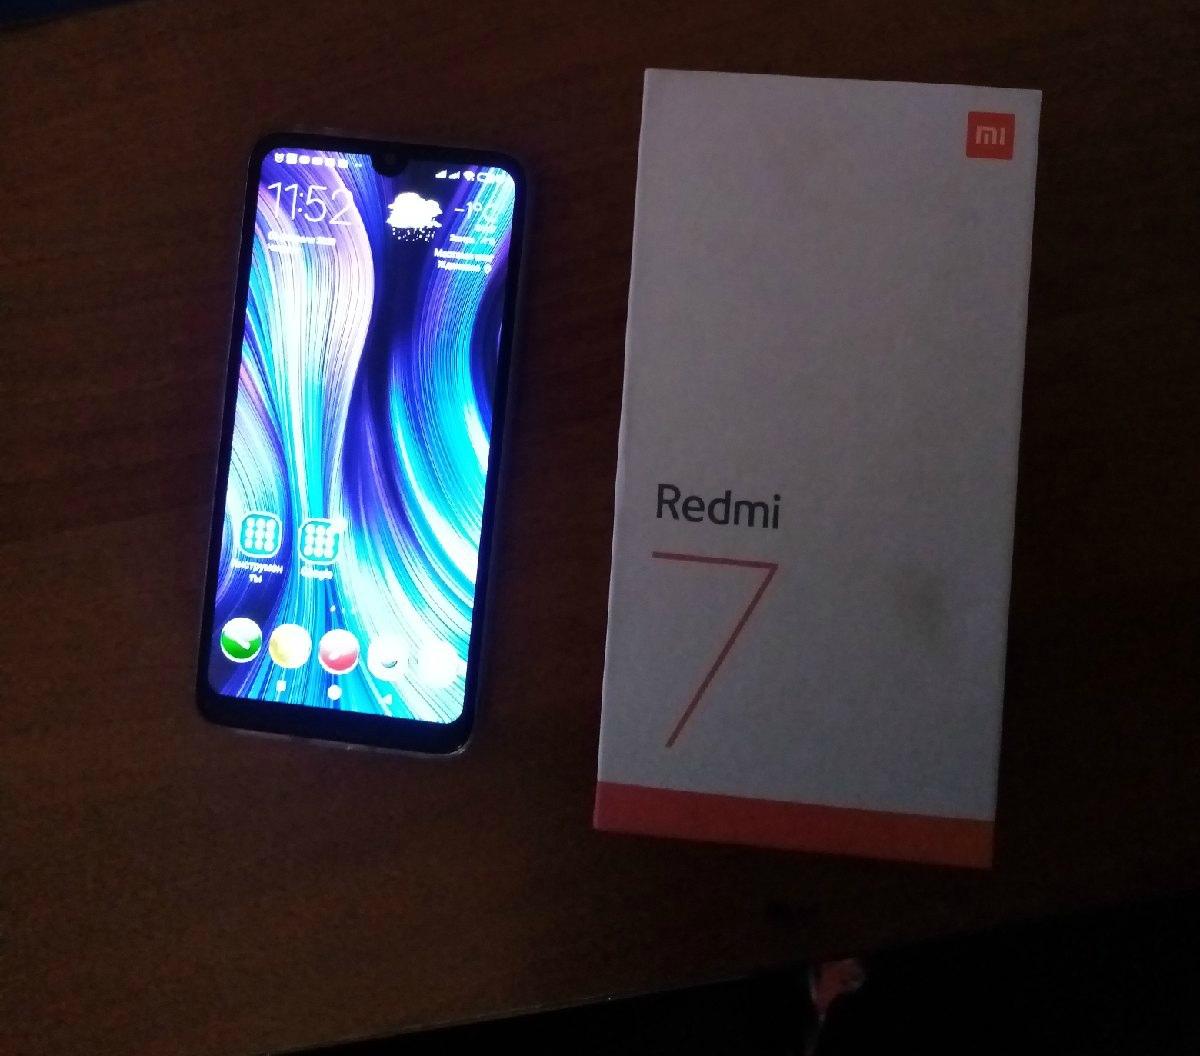 Продам Xiaomi Redmi 7 3/32GB Цена 7500